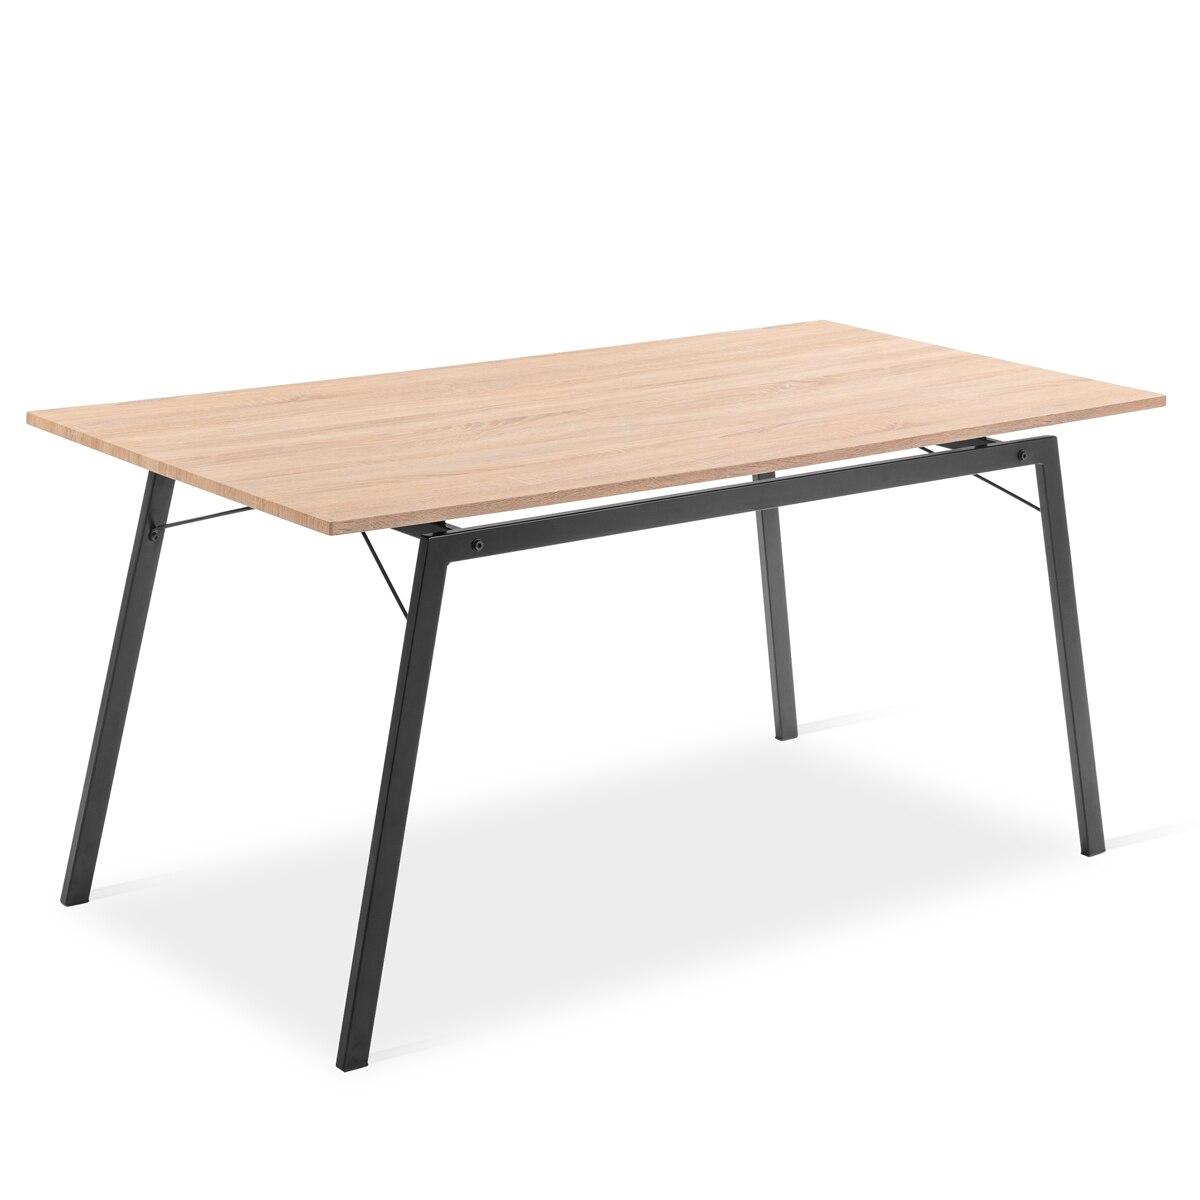 Table For Dining Room Fashion Design Rectangular Wood Finish Mdf And Black, Modern GASHIRA Model For Salon, Kitchen 160x80x75cm